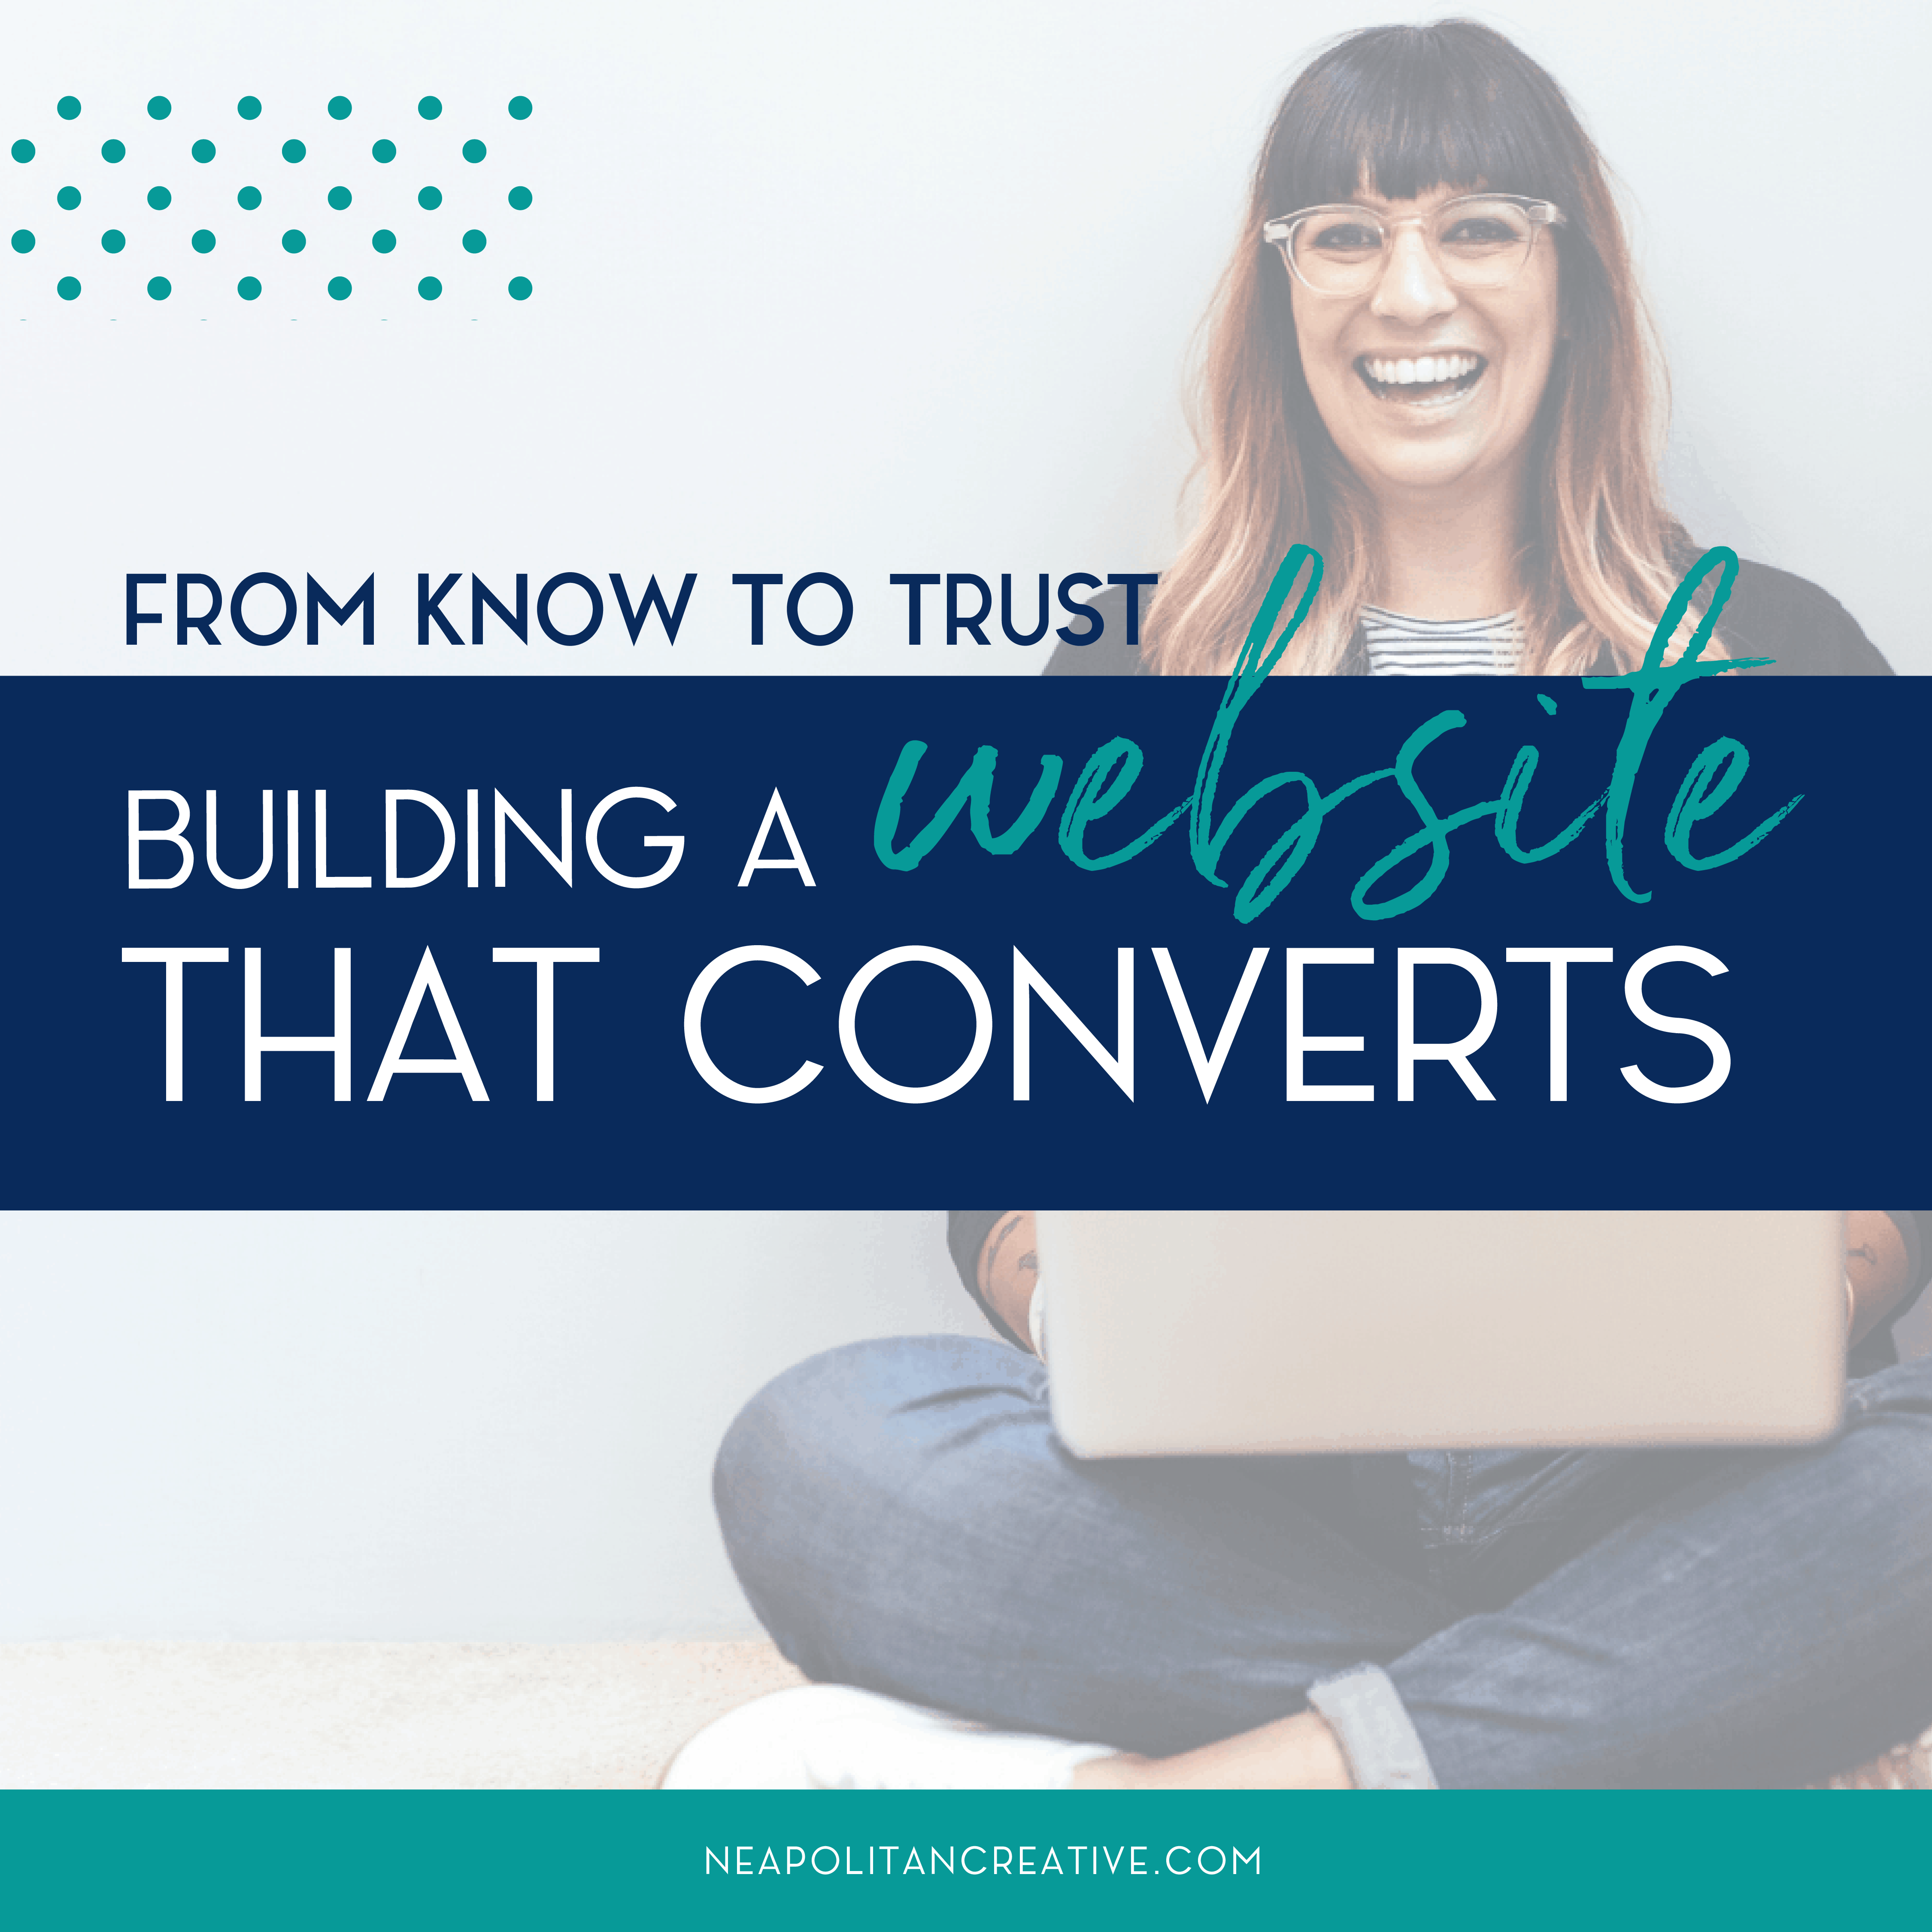 a website that converts